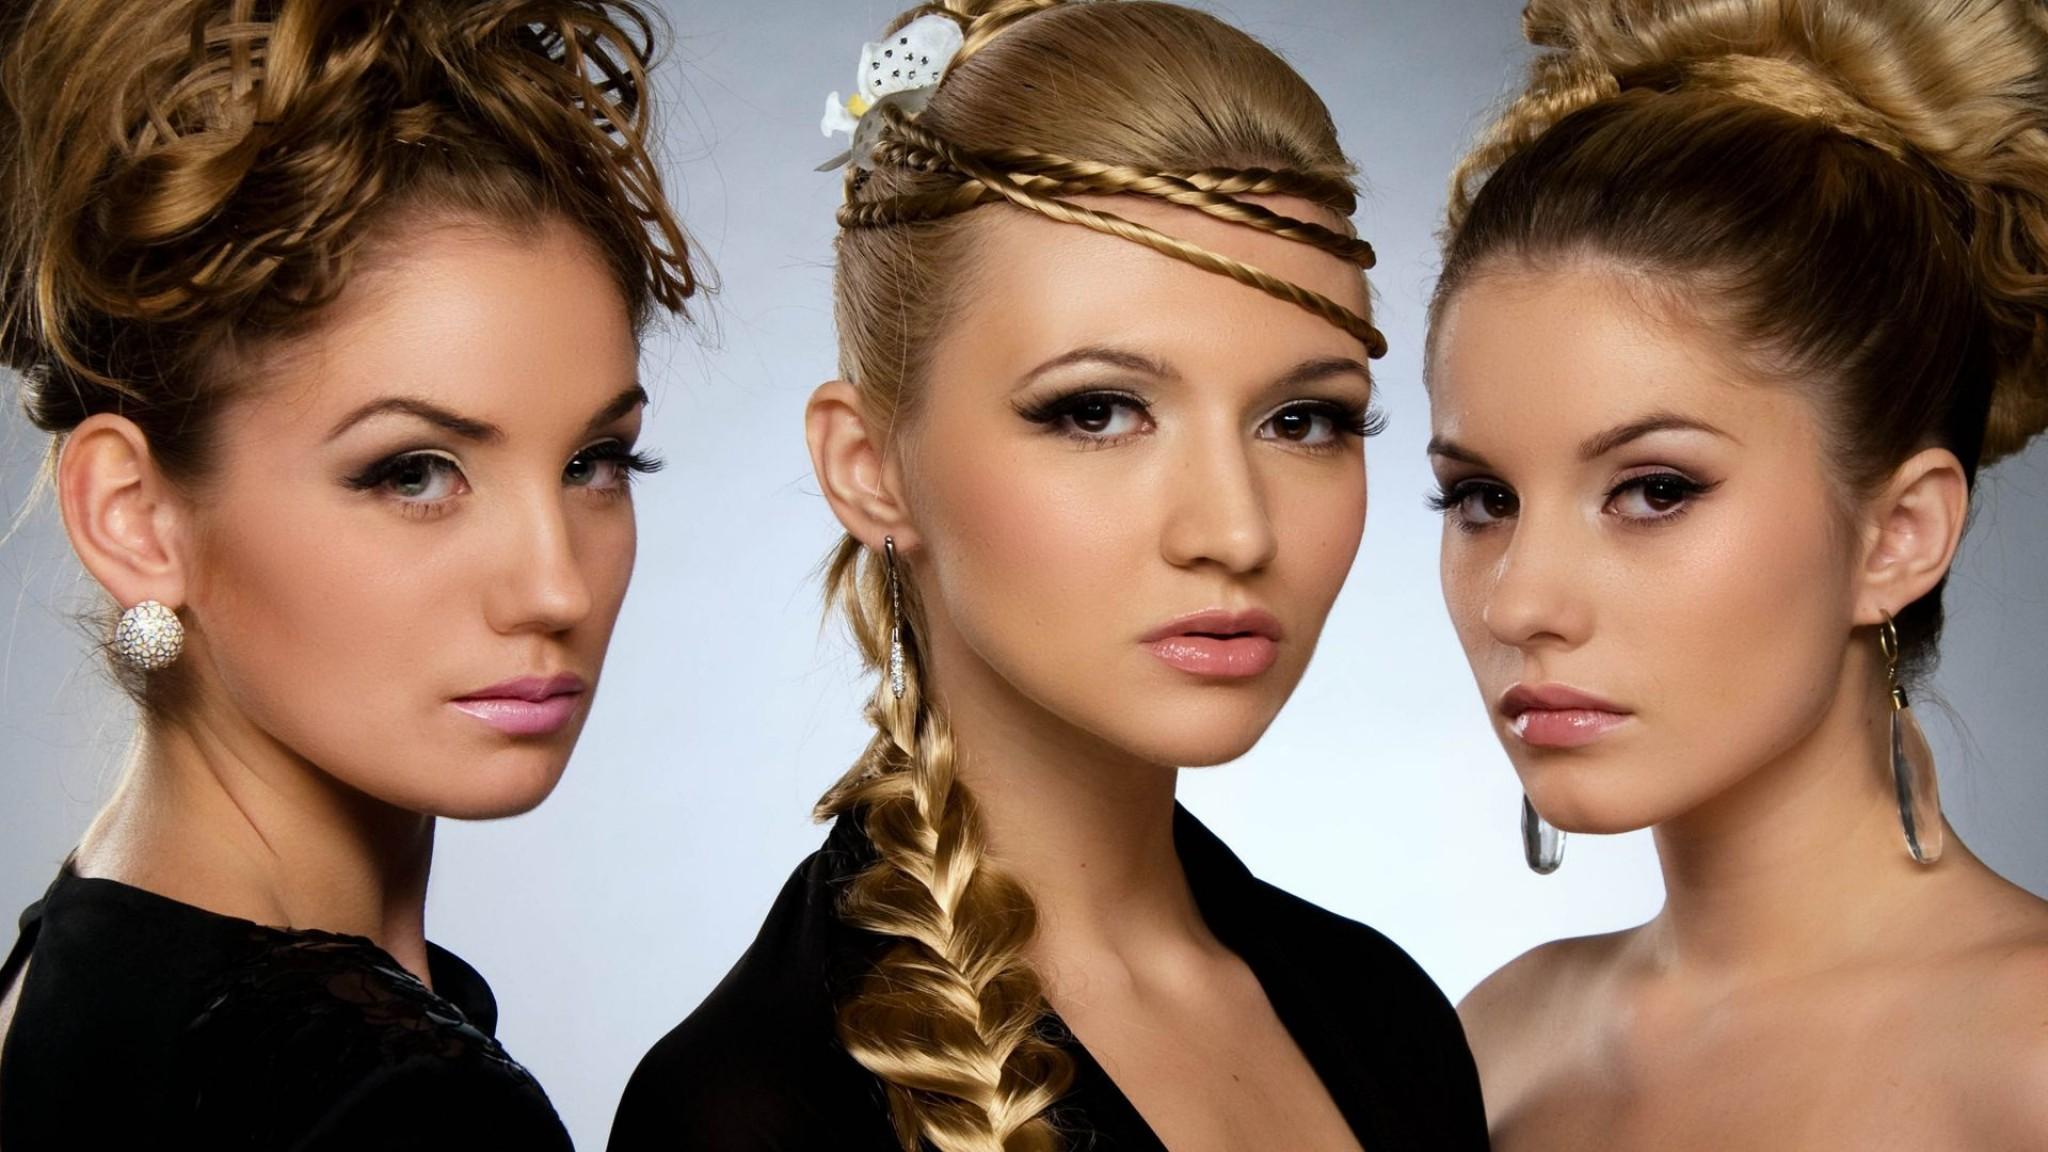 Vogue  Hairstyles  Girls  HD HD Wallpaper